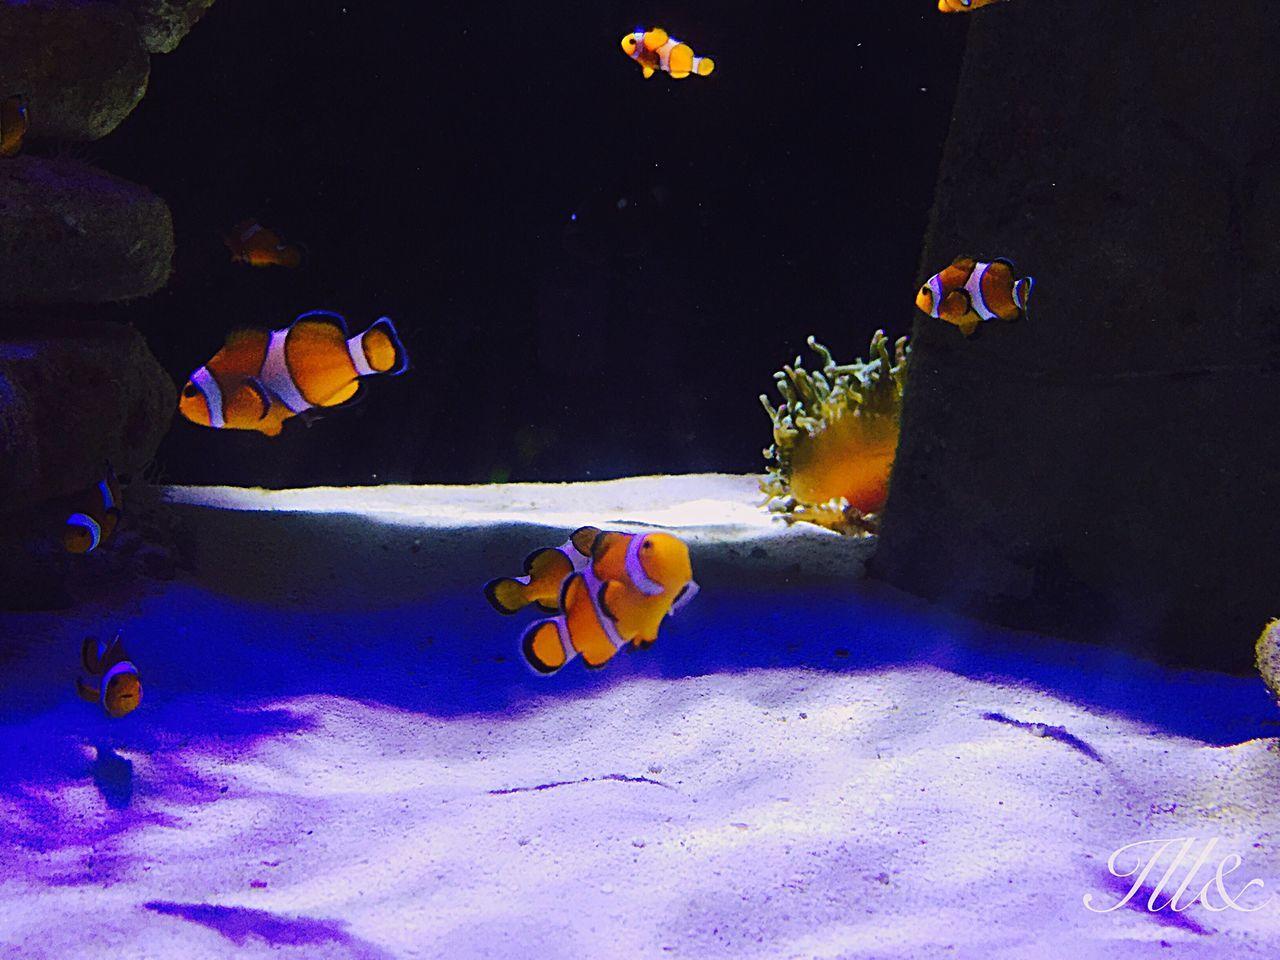 Bahamas Nassau Atlantis Hotel Clownfish MyAdventure Sailor Ill&